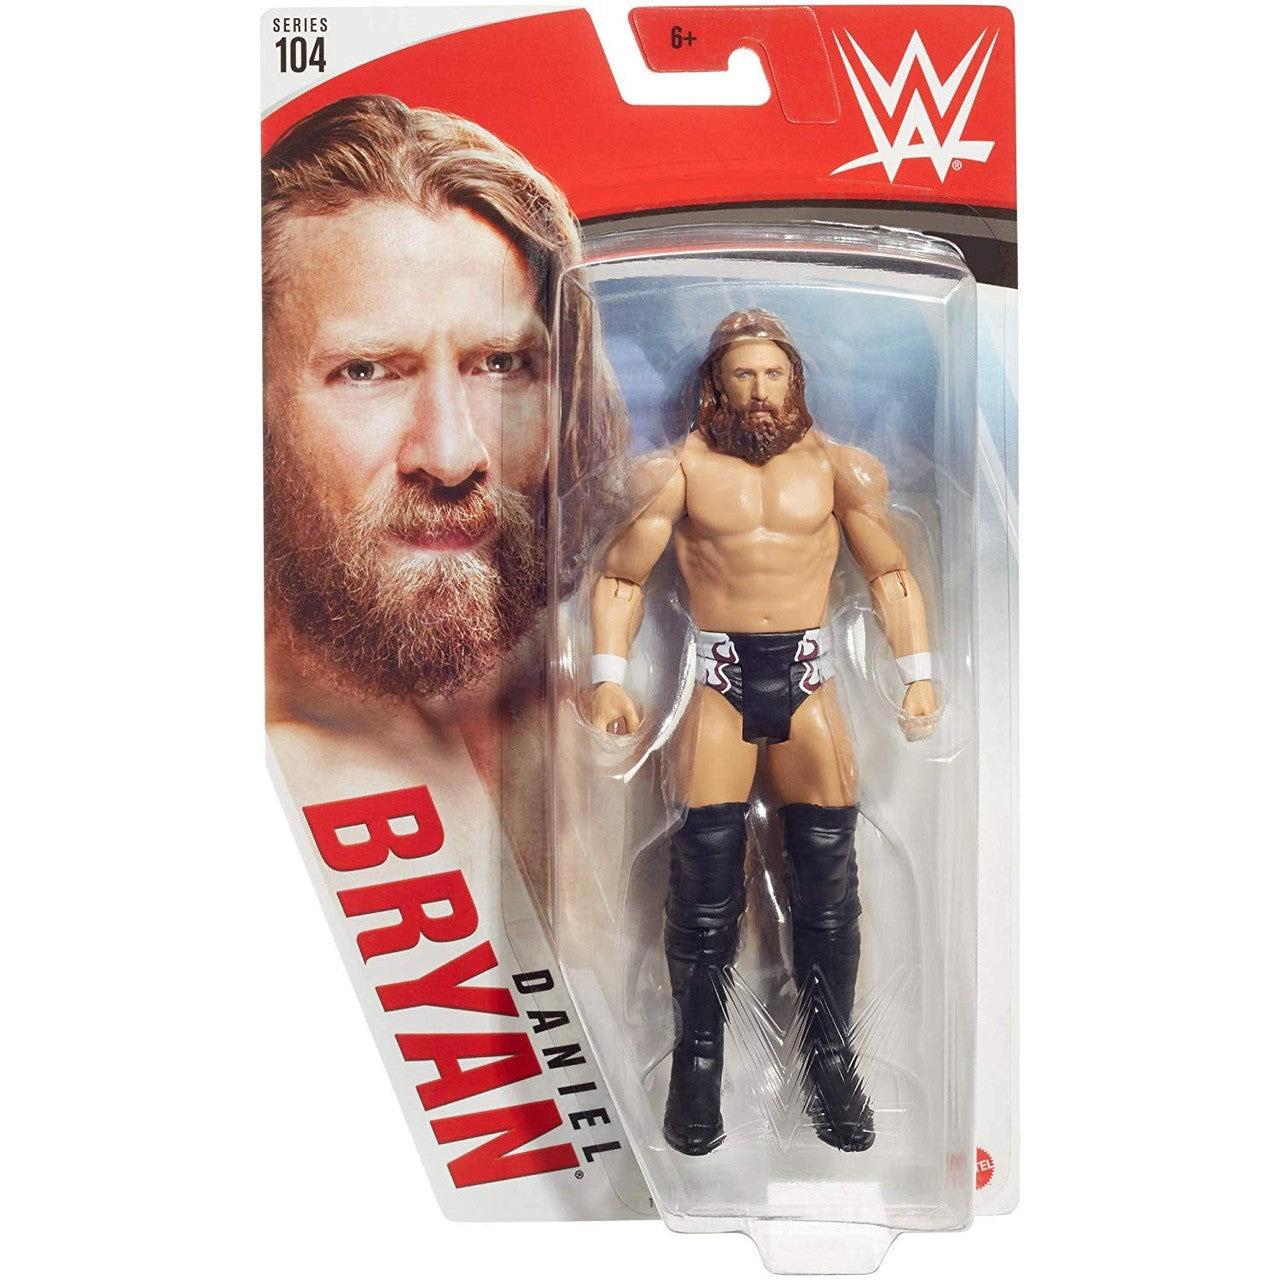 Image of WWE Basic Figure Series 104 - Daniel Bryan